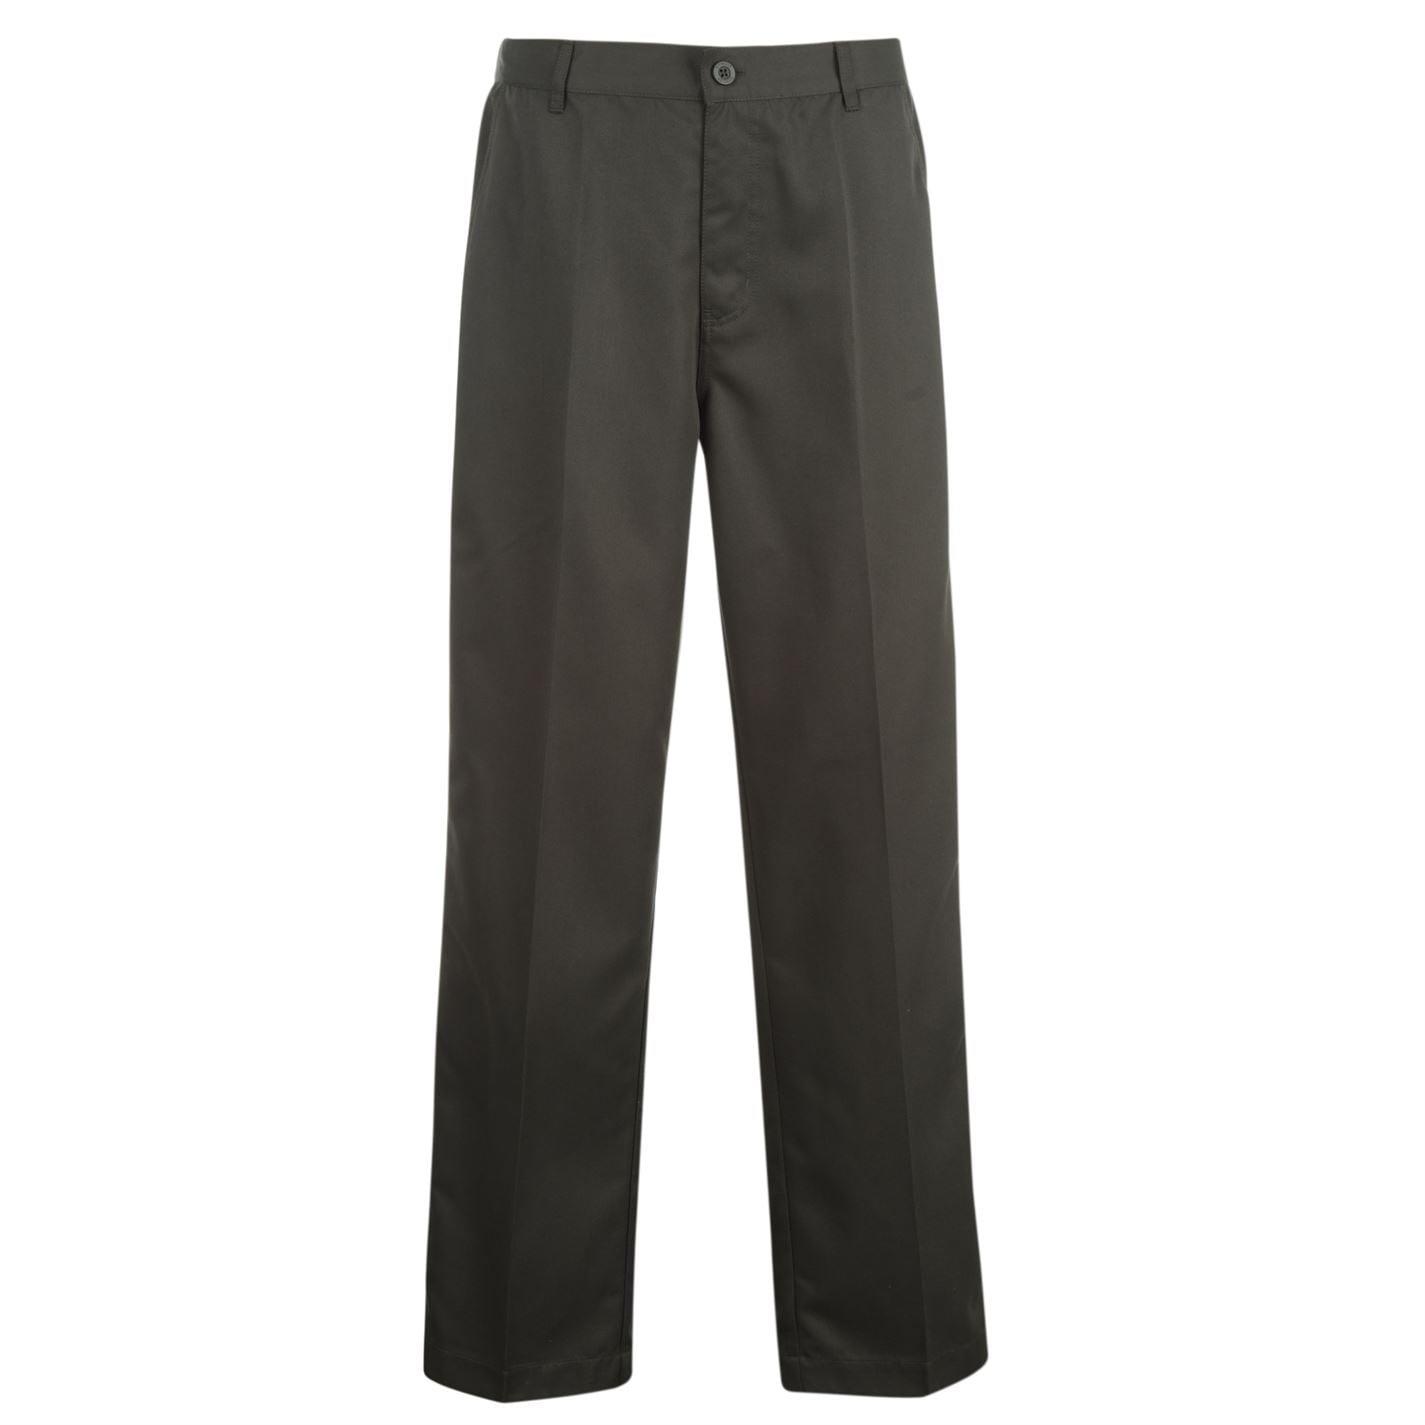 dunlop mens clothing golf trouser pants